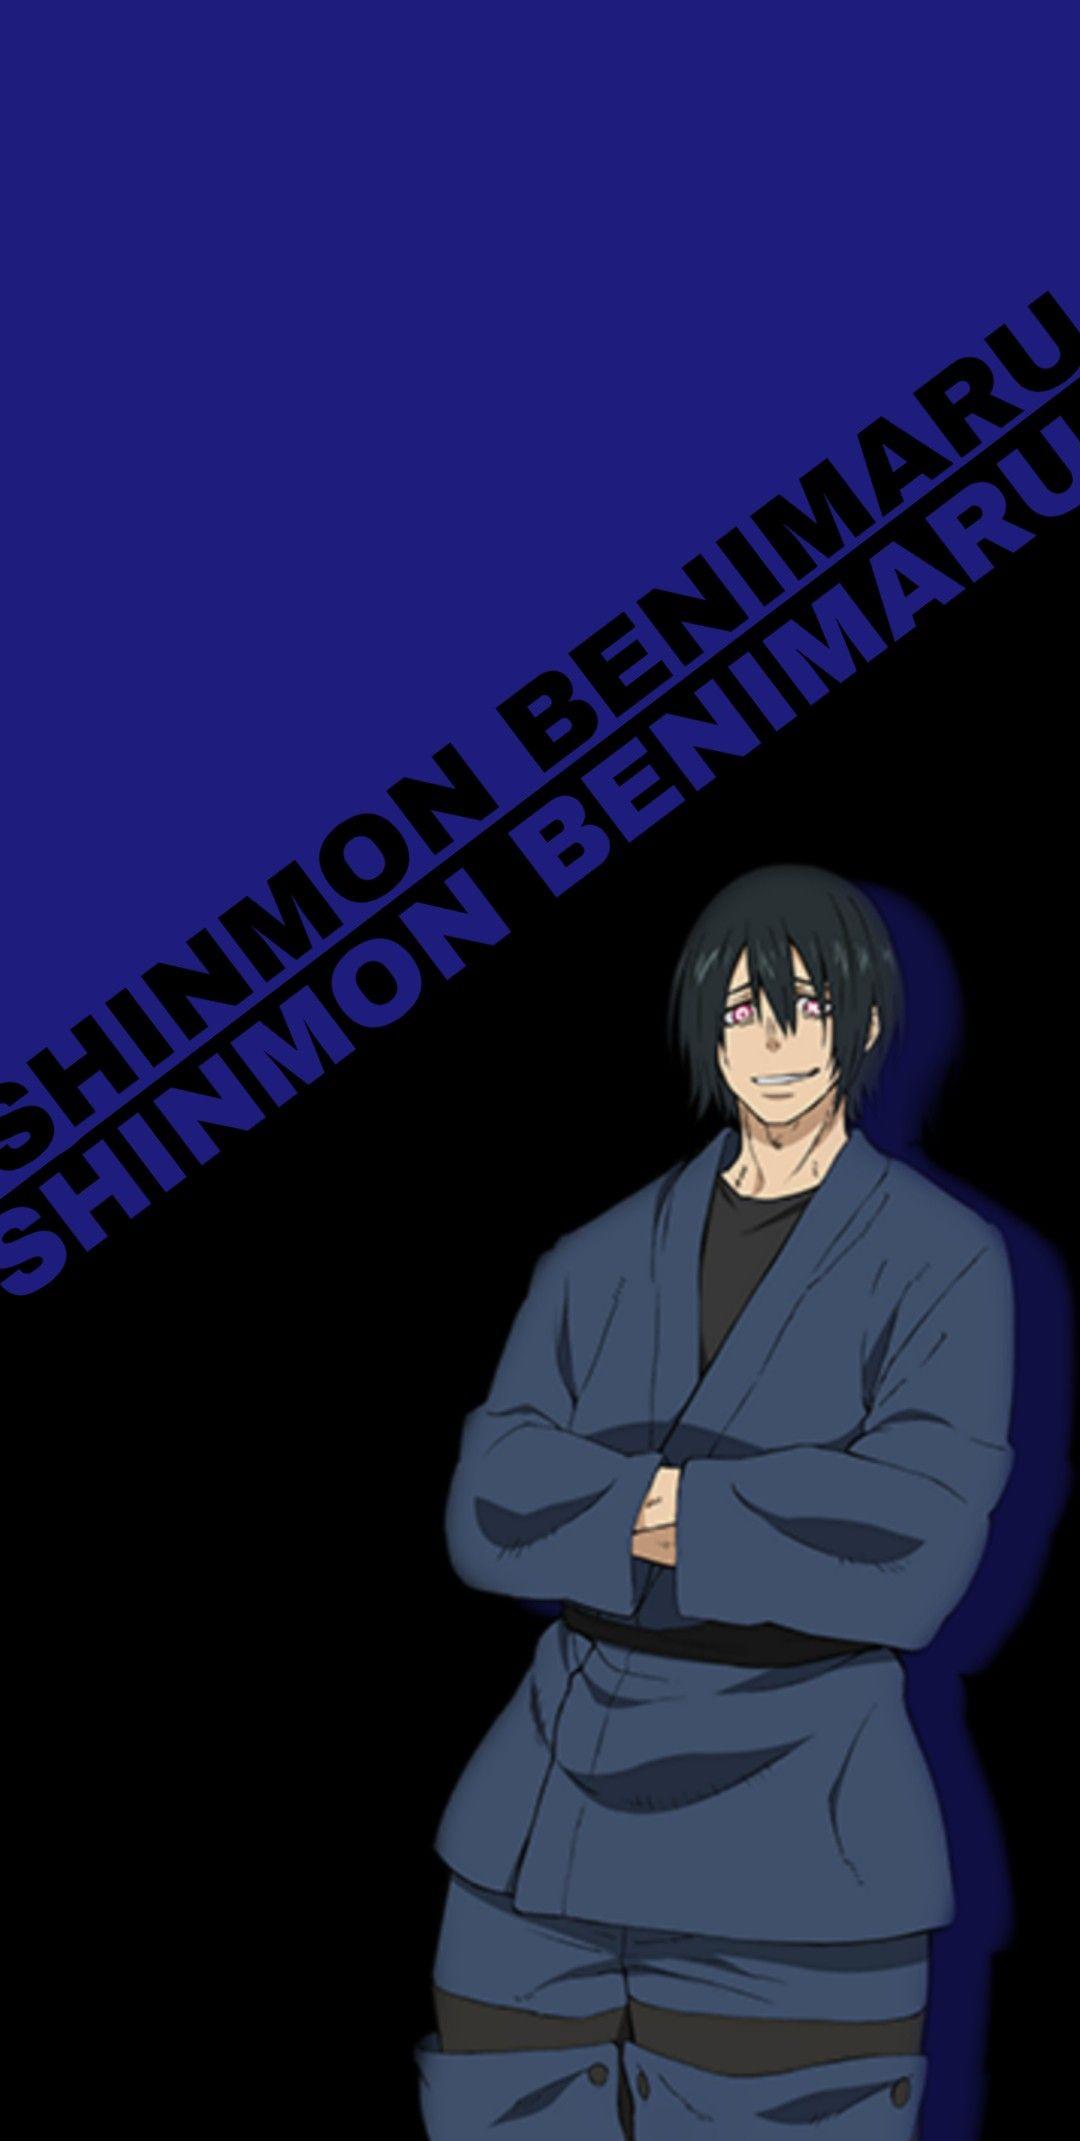 Shinmon Benimaru Wallpaper Dark Anime Guys Anime Wallpaper Anime Background Fire force wallpapers for free download. shinmon benimaru wallpaper dark anime